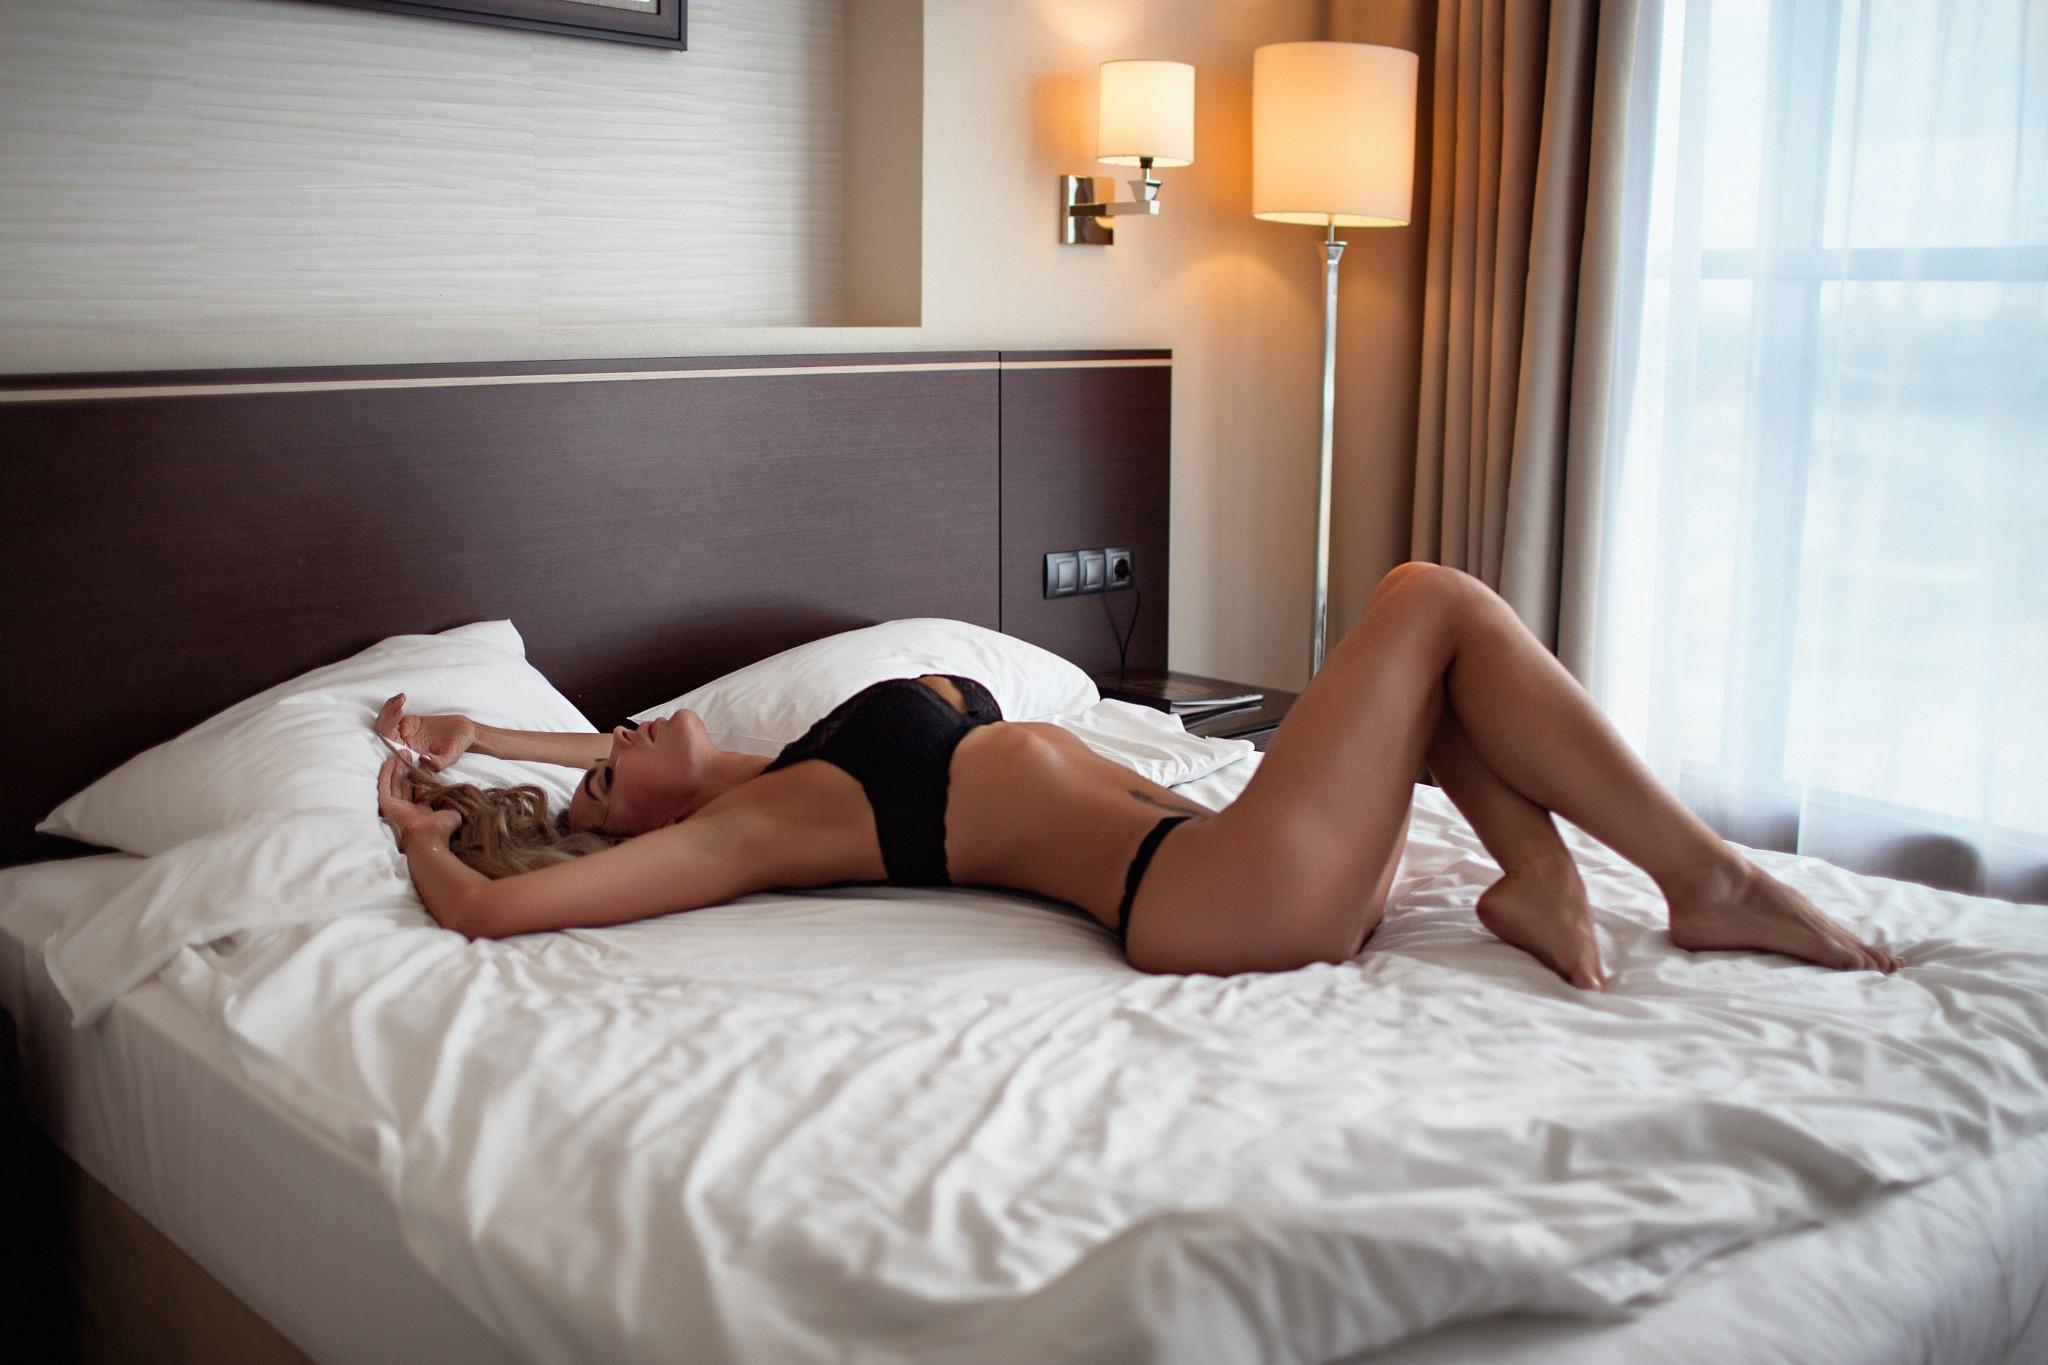 Девушка лежит в кровати фото на телефон